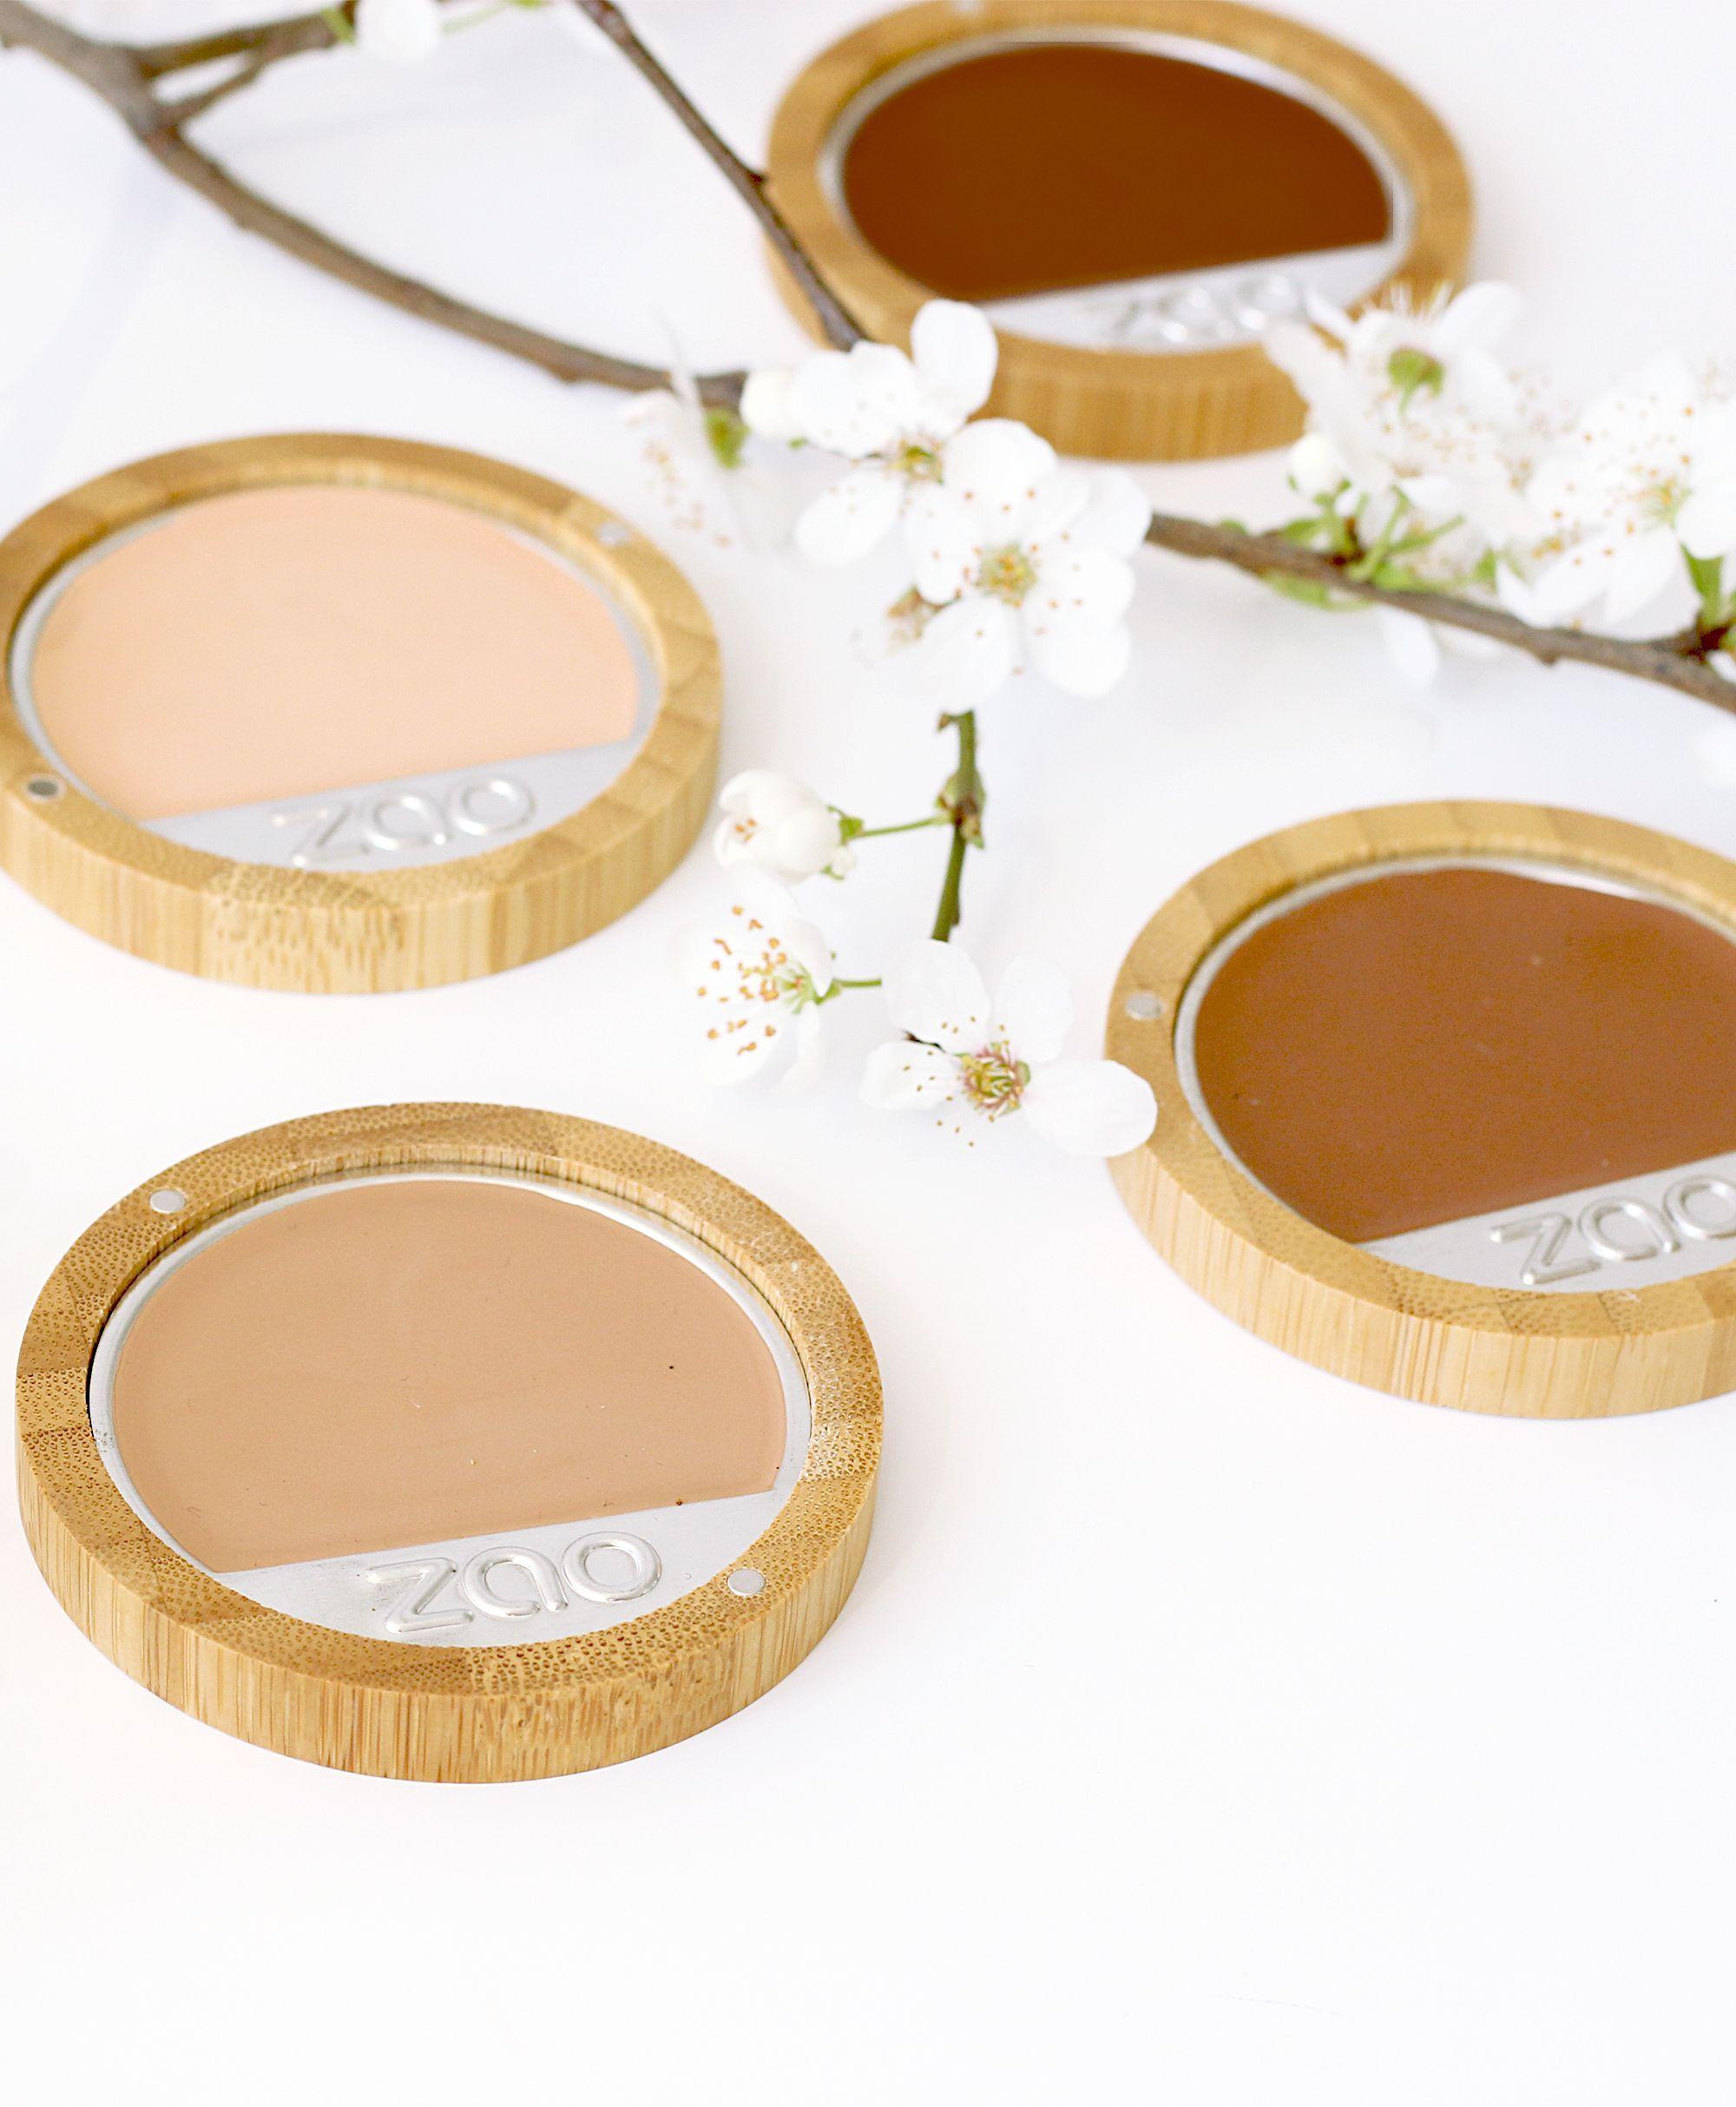 Zao Cream Foundation will provide your complexion a full